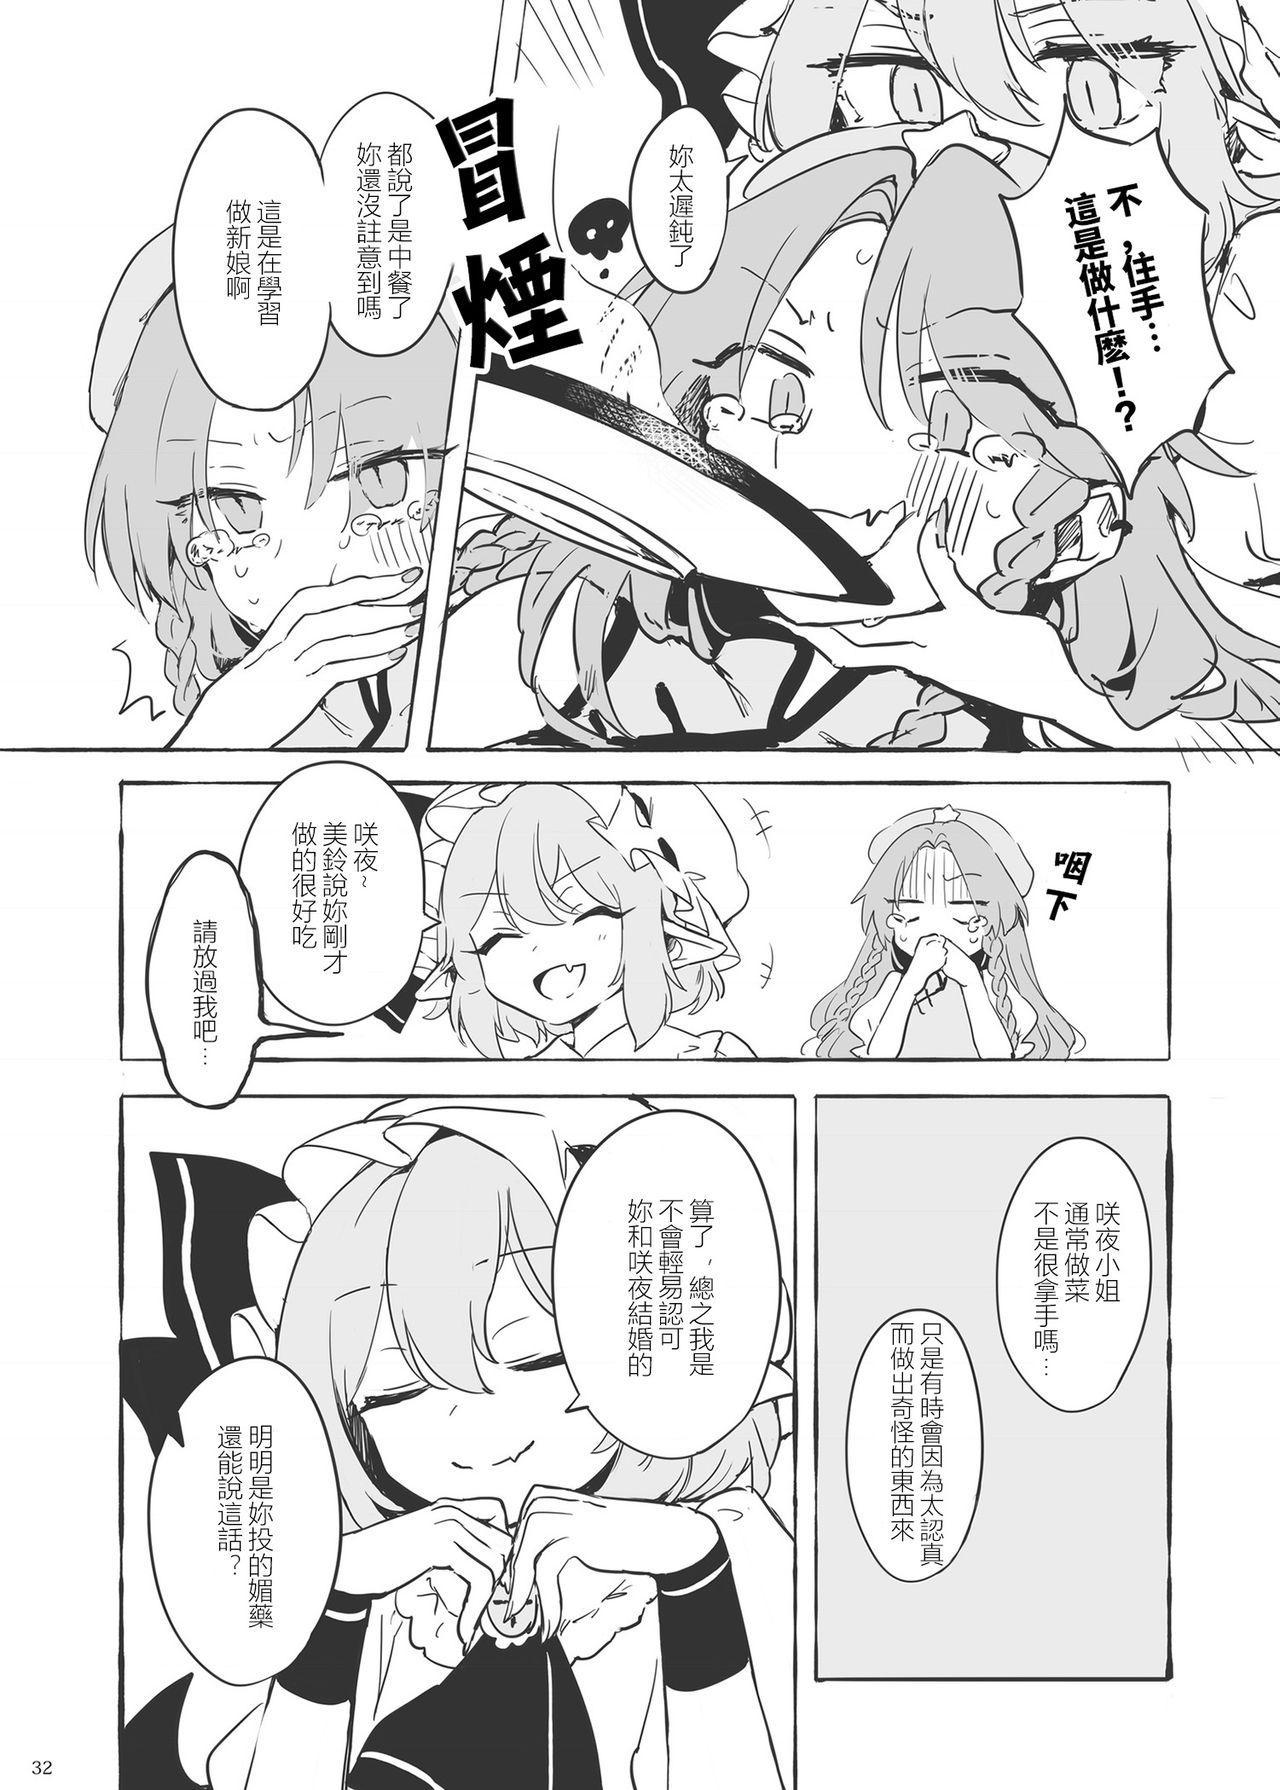 Meiling ni Kawaigarareru Sakuya-san ga Mitai Hon   想看被美鈴寵愛的咲夜小姐的同人本 31